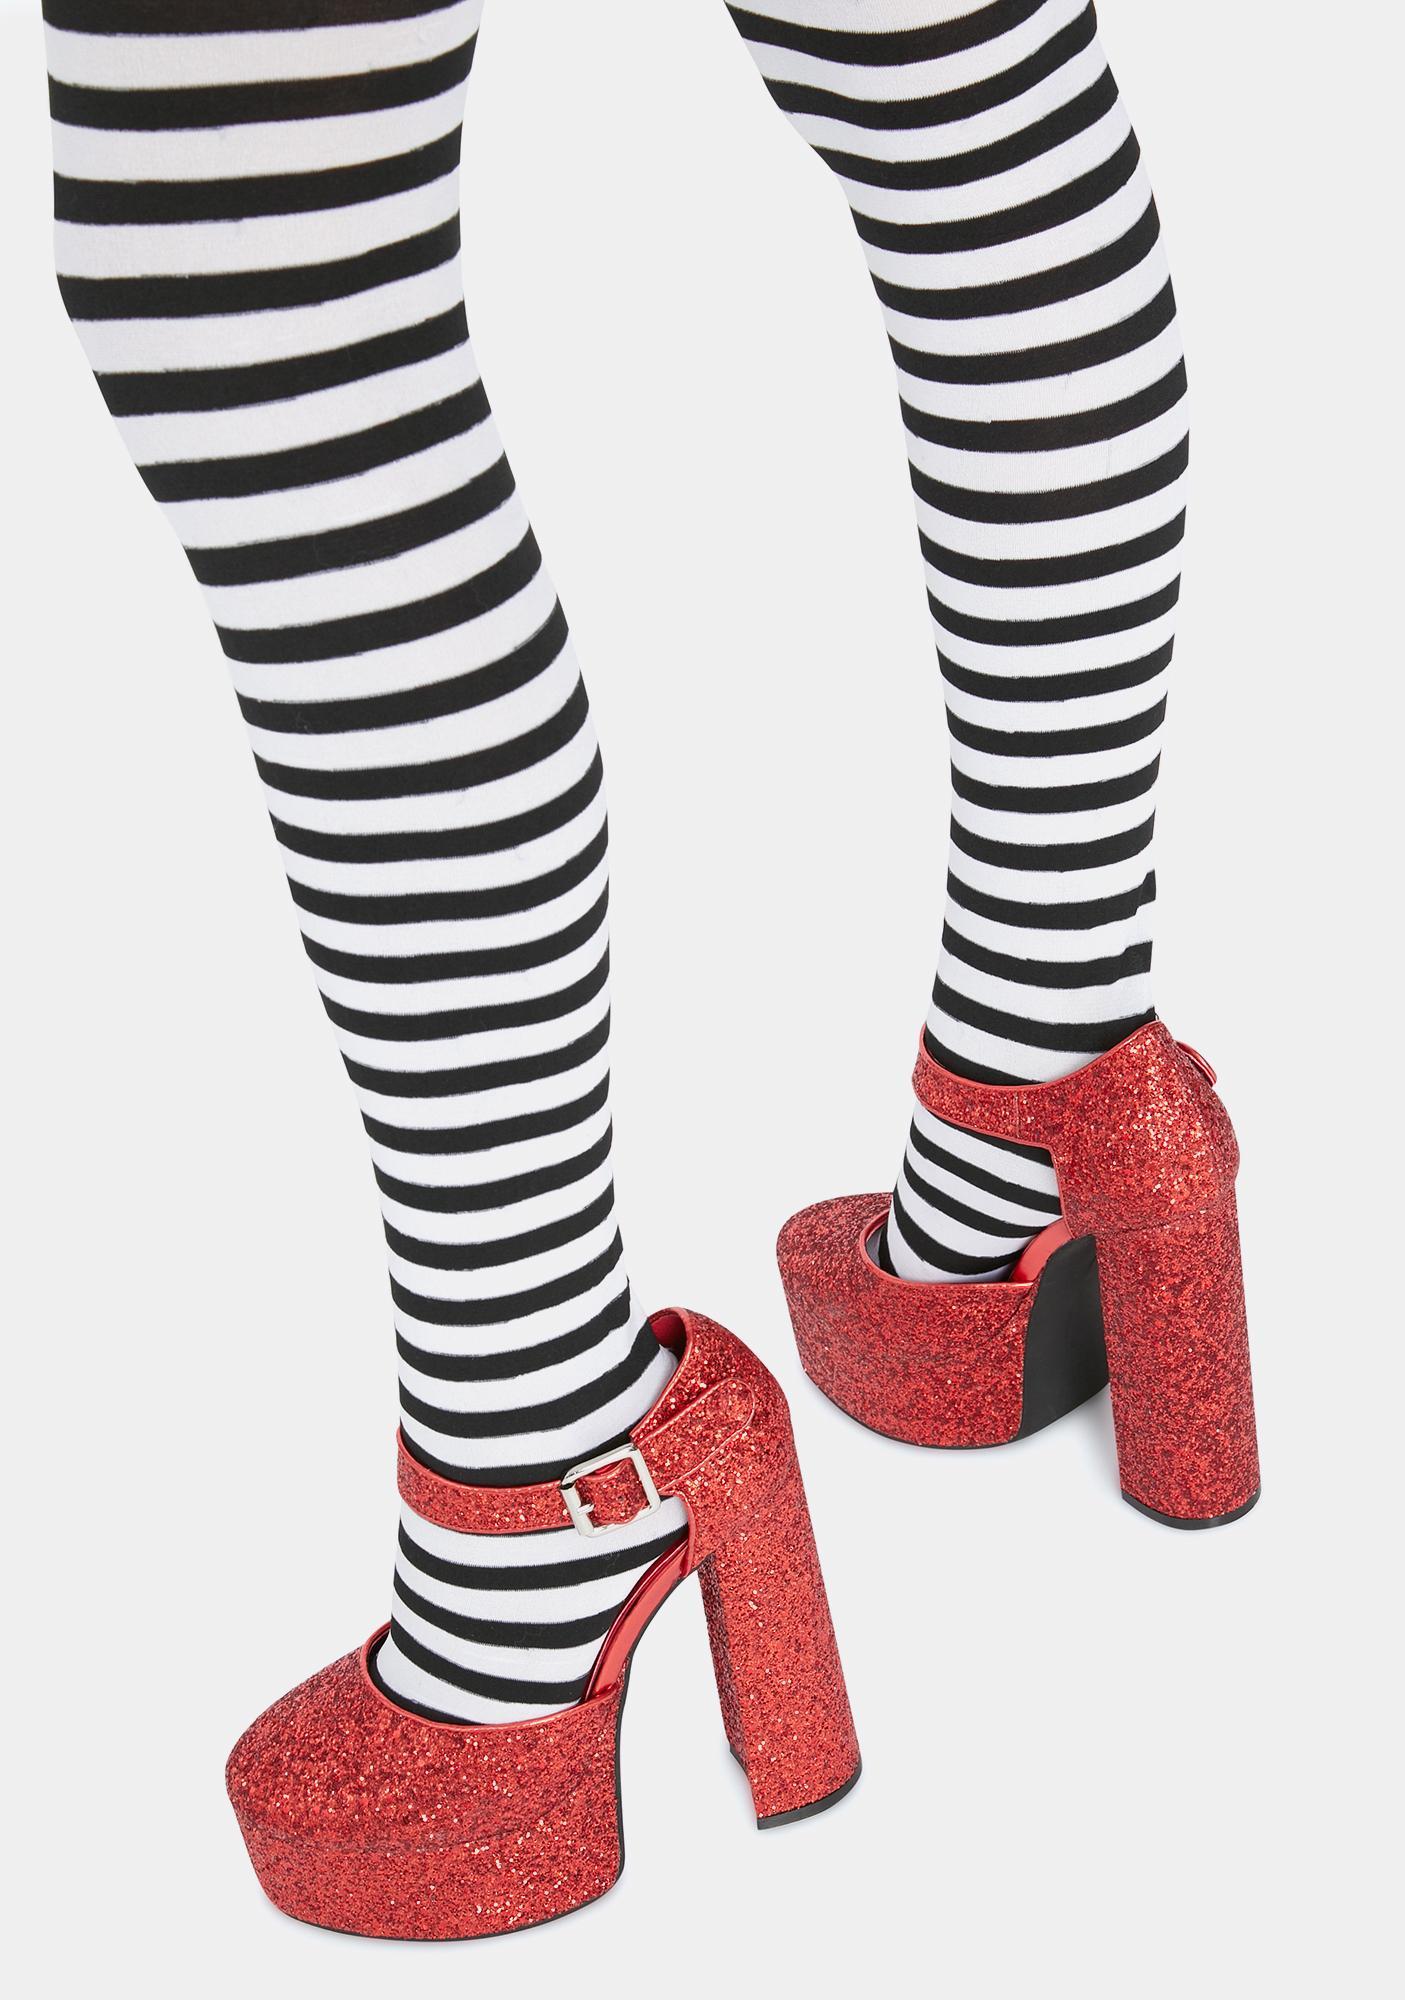 Trickz N' Treatz Ruby Shine By Night Glitter Heels